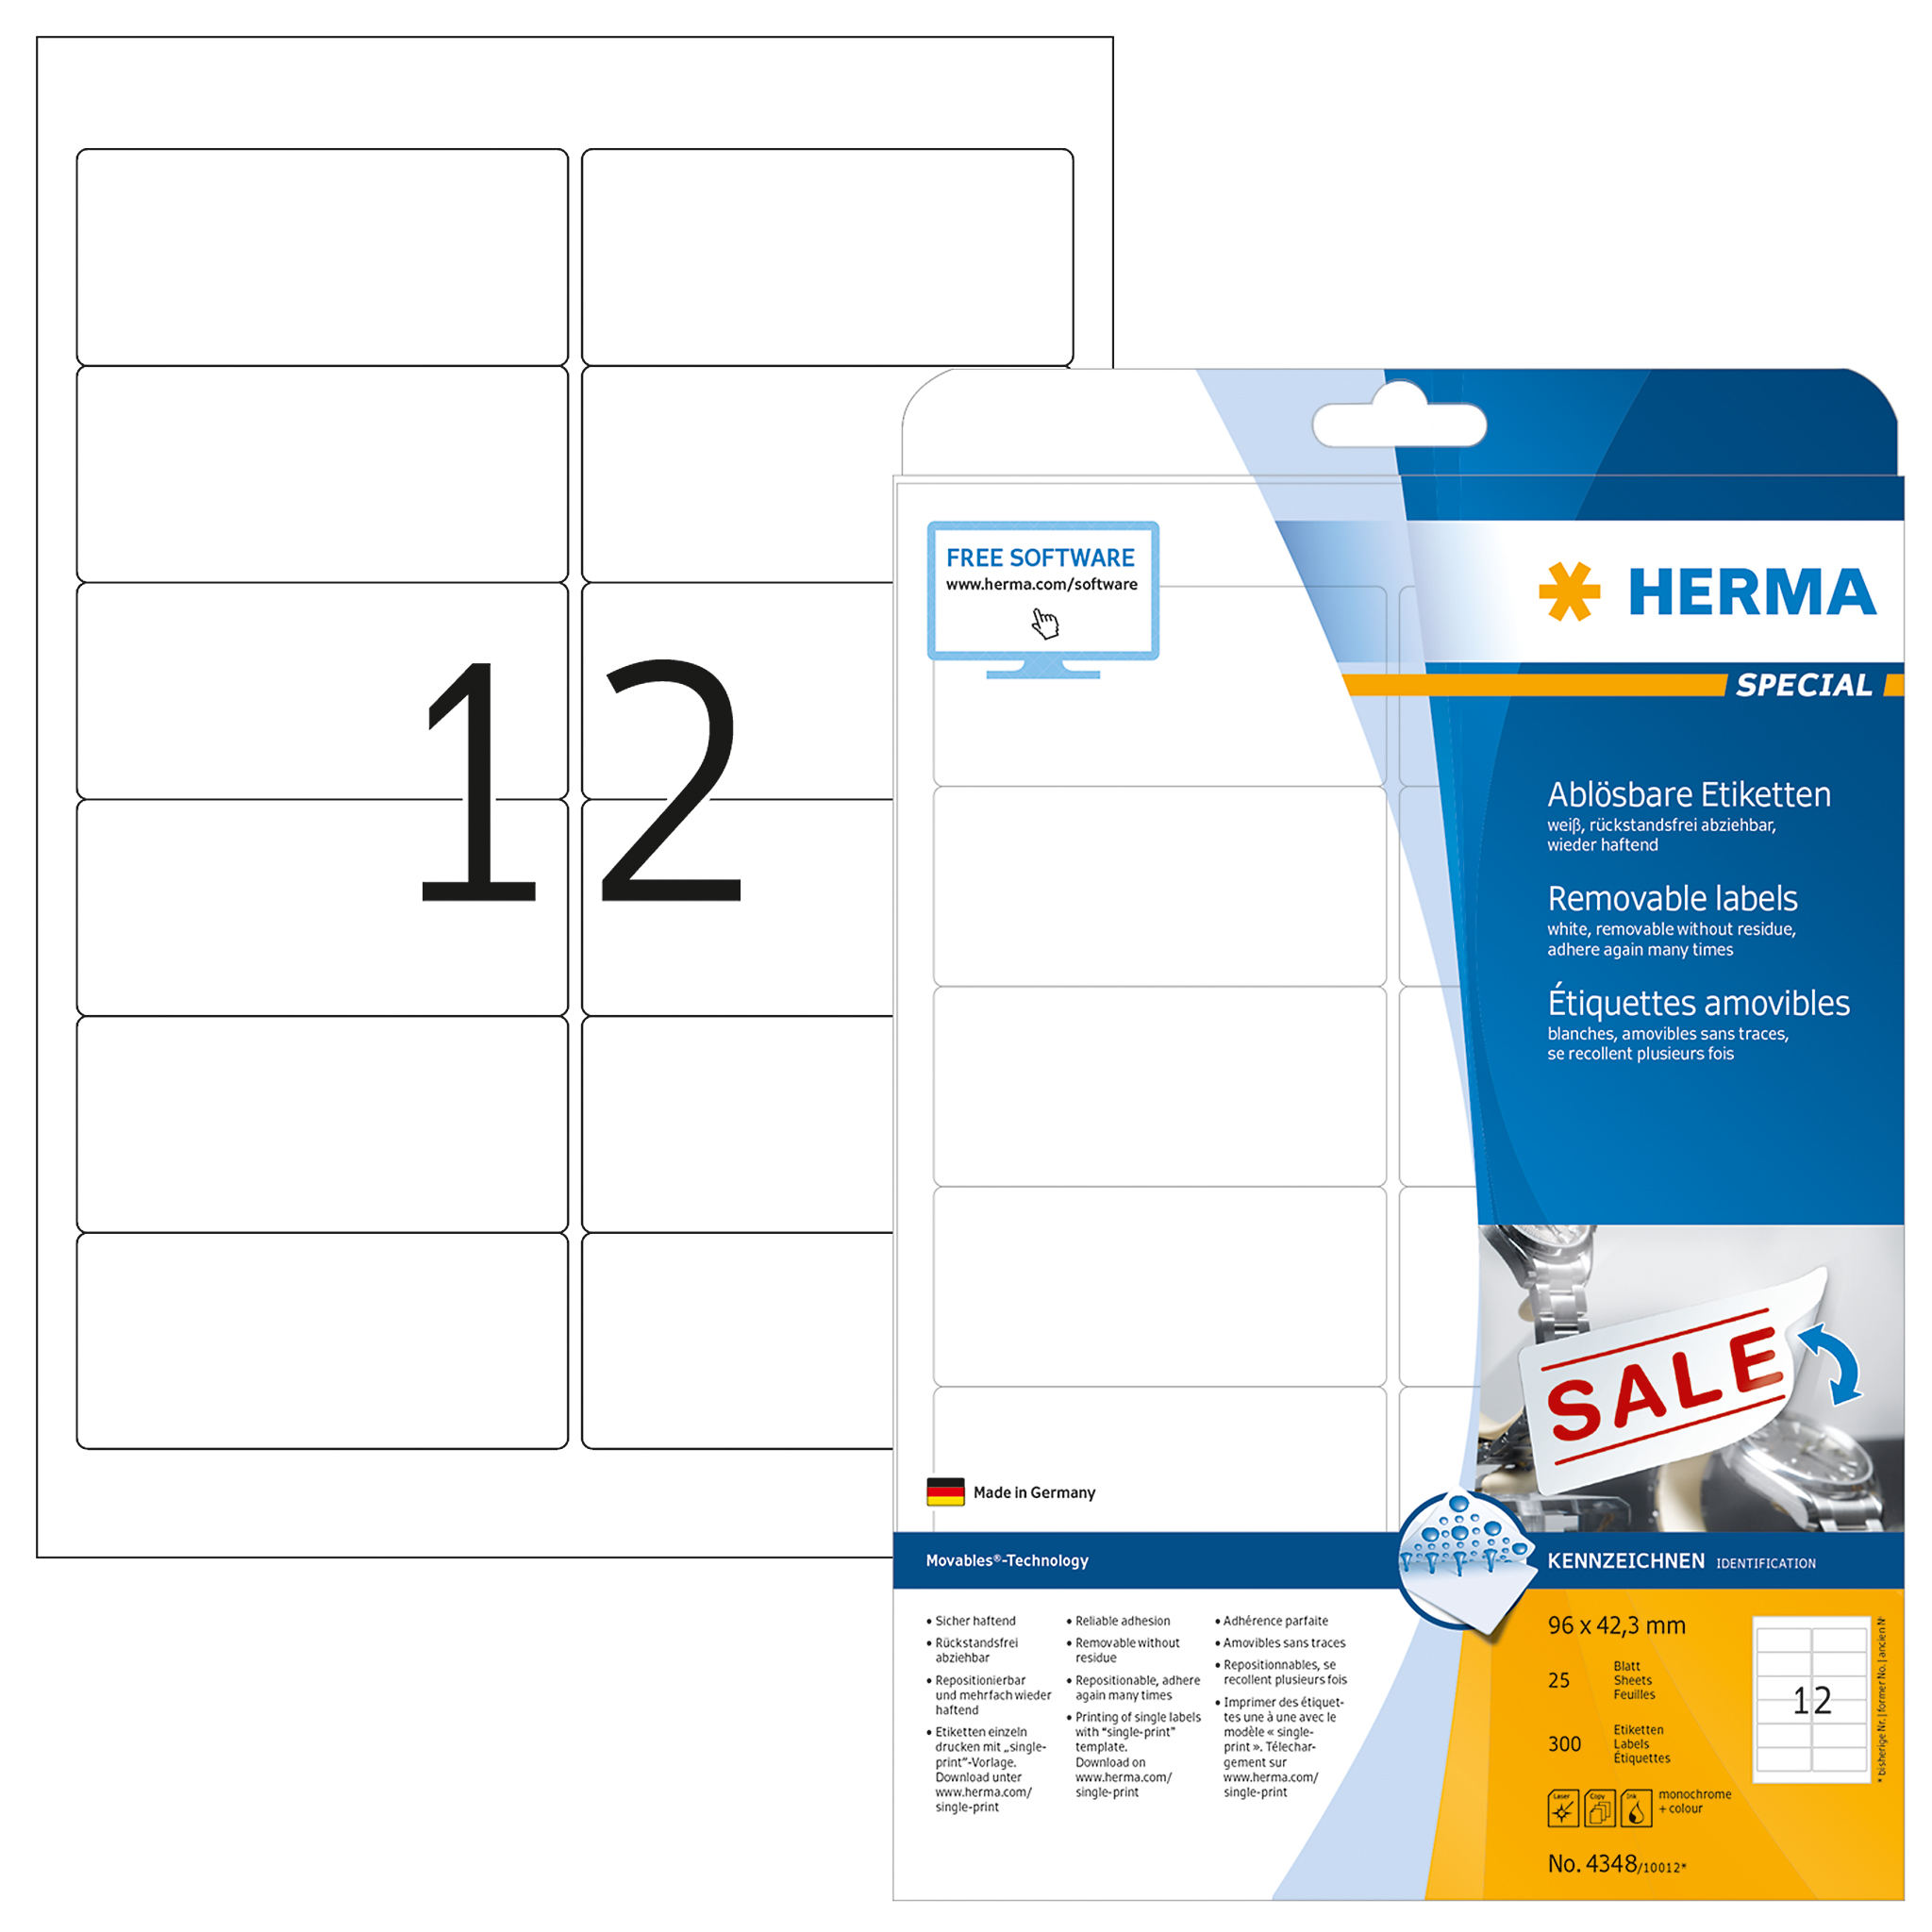 Ablösbare Etiketten A4 - HERMA 4348 - 96x42,3 mm Movables 300 St.